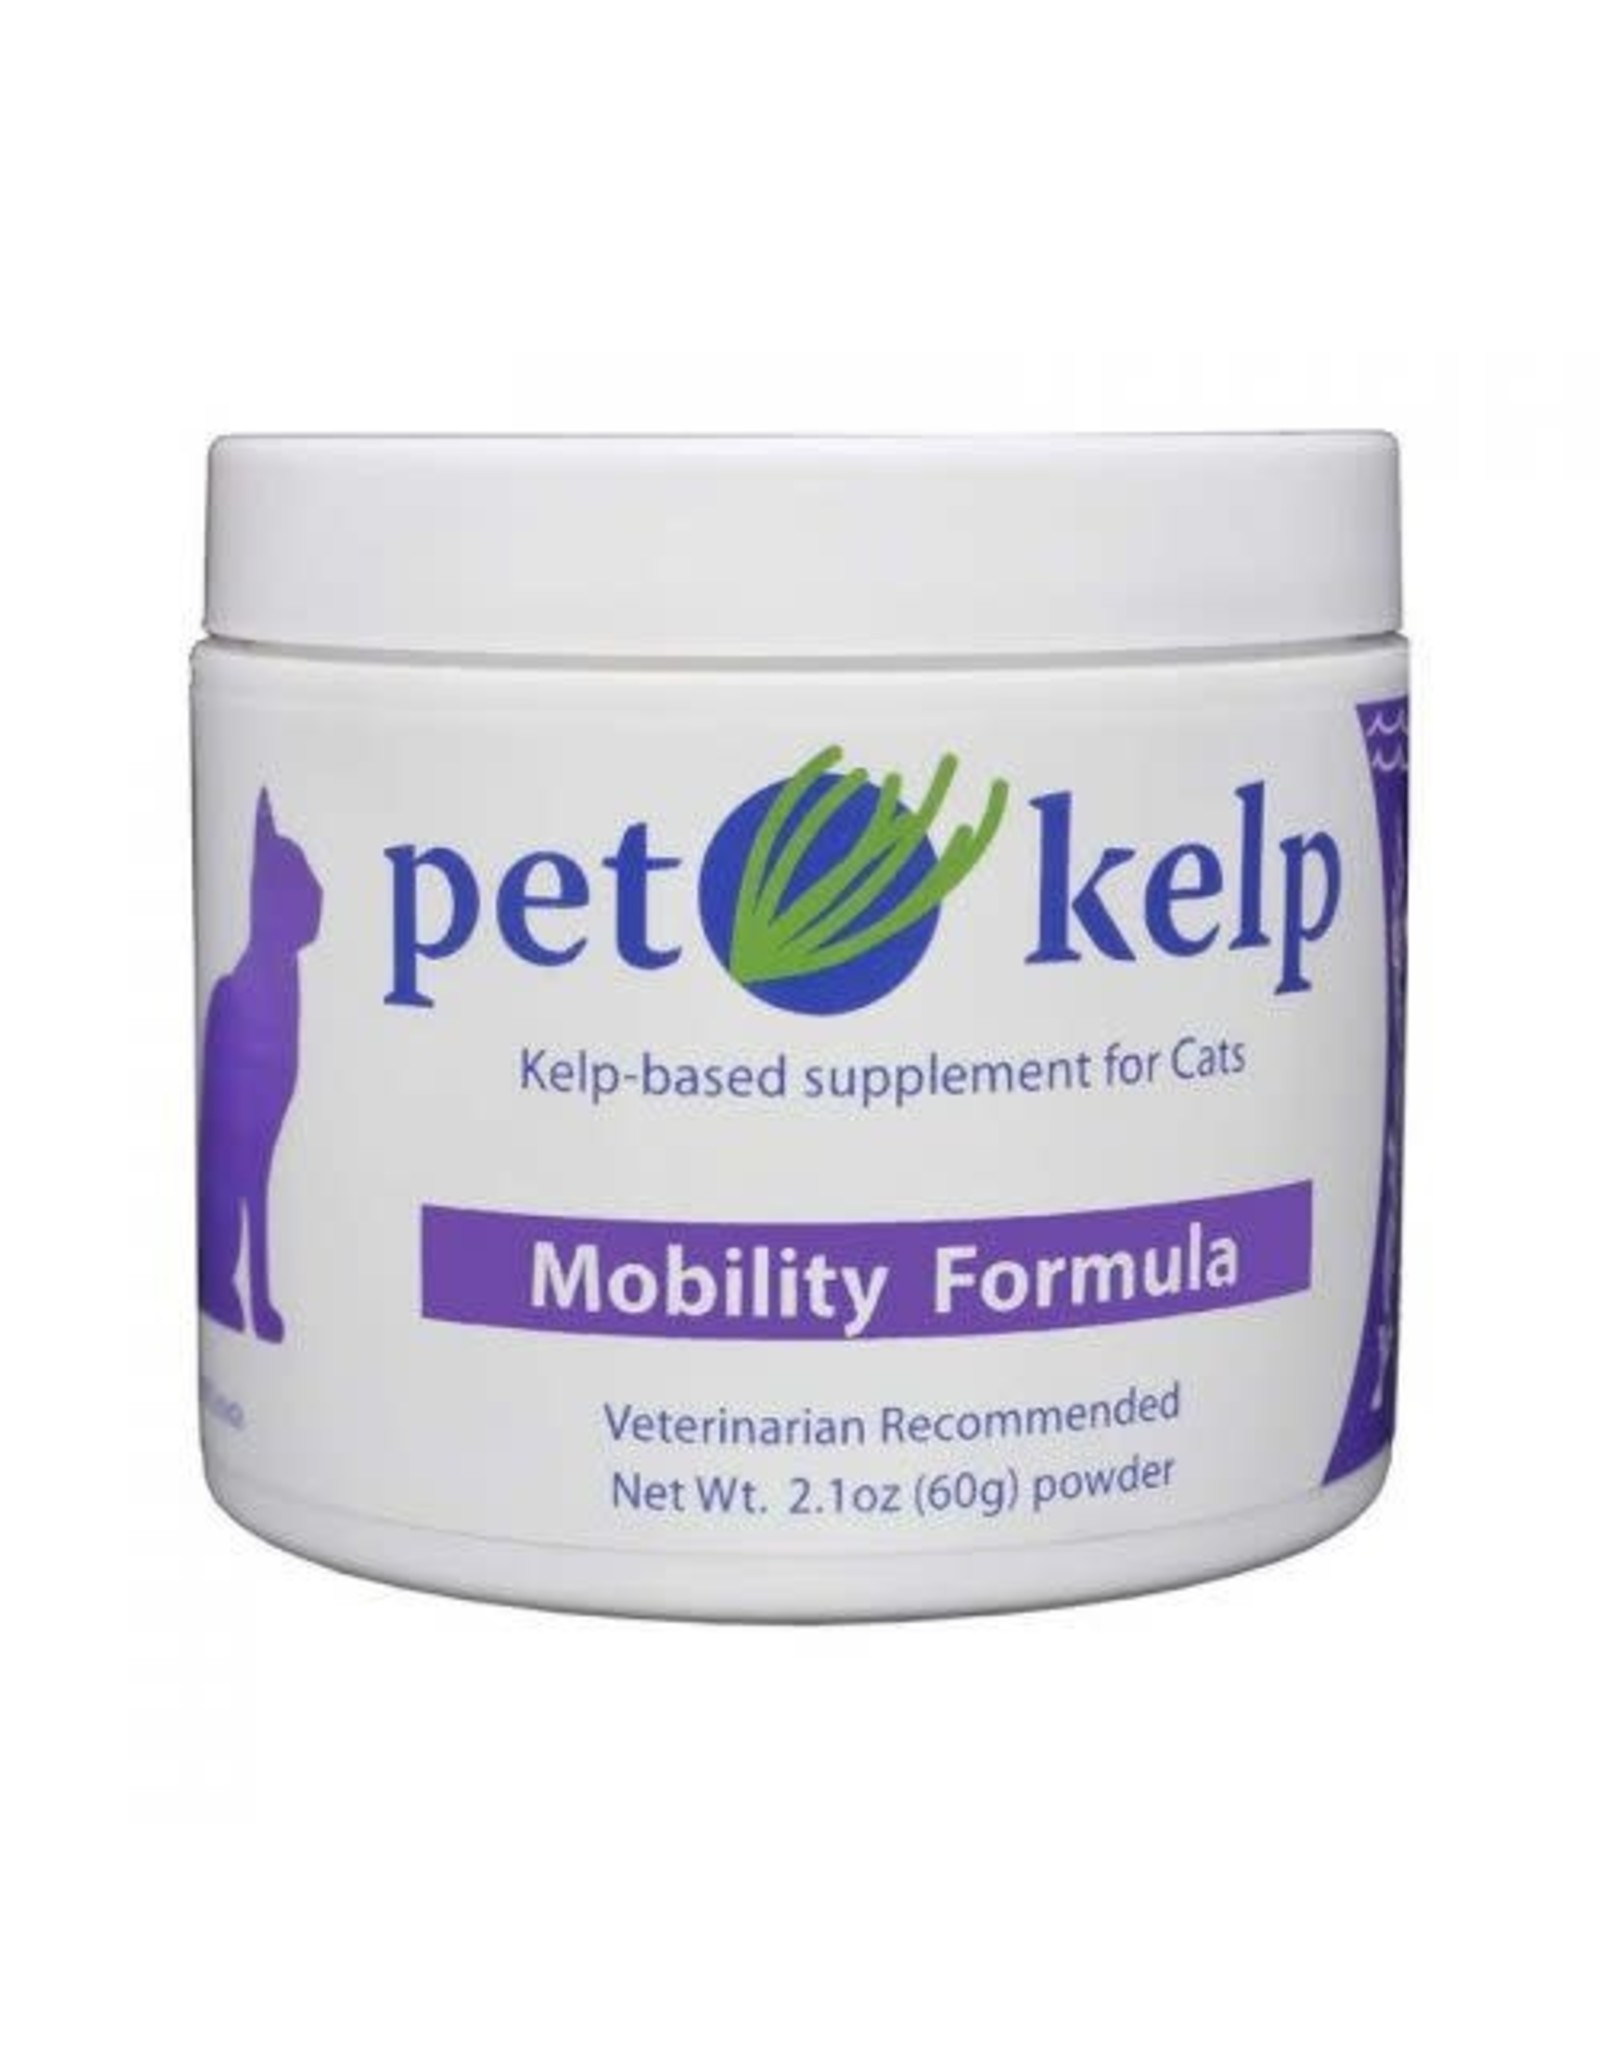 Pet Kelp Pet Kelp Cat Supplement - Mobility Formula 2.1oz